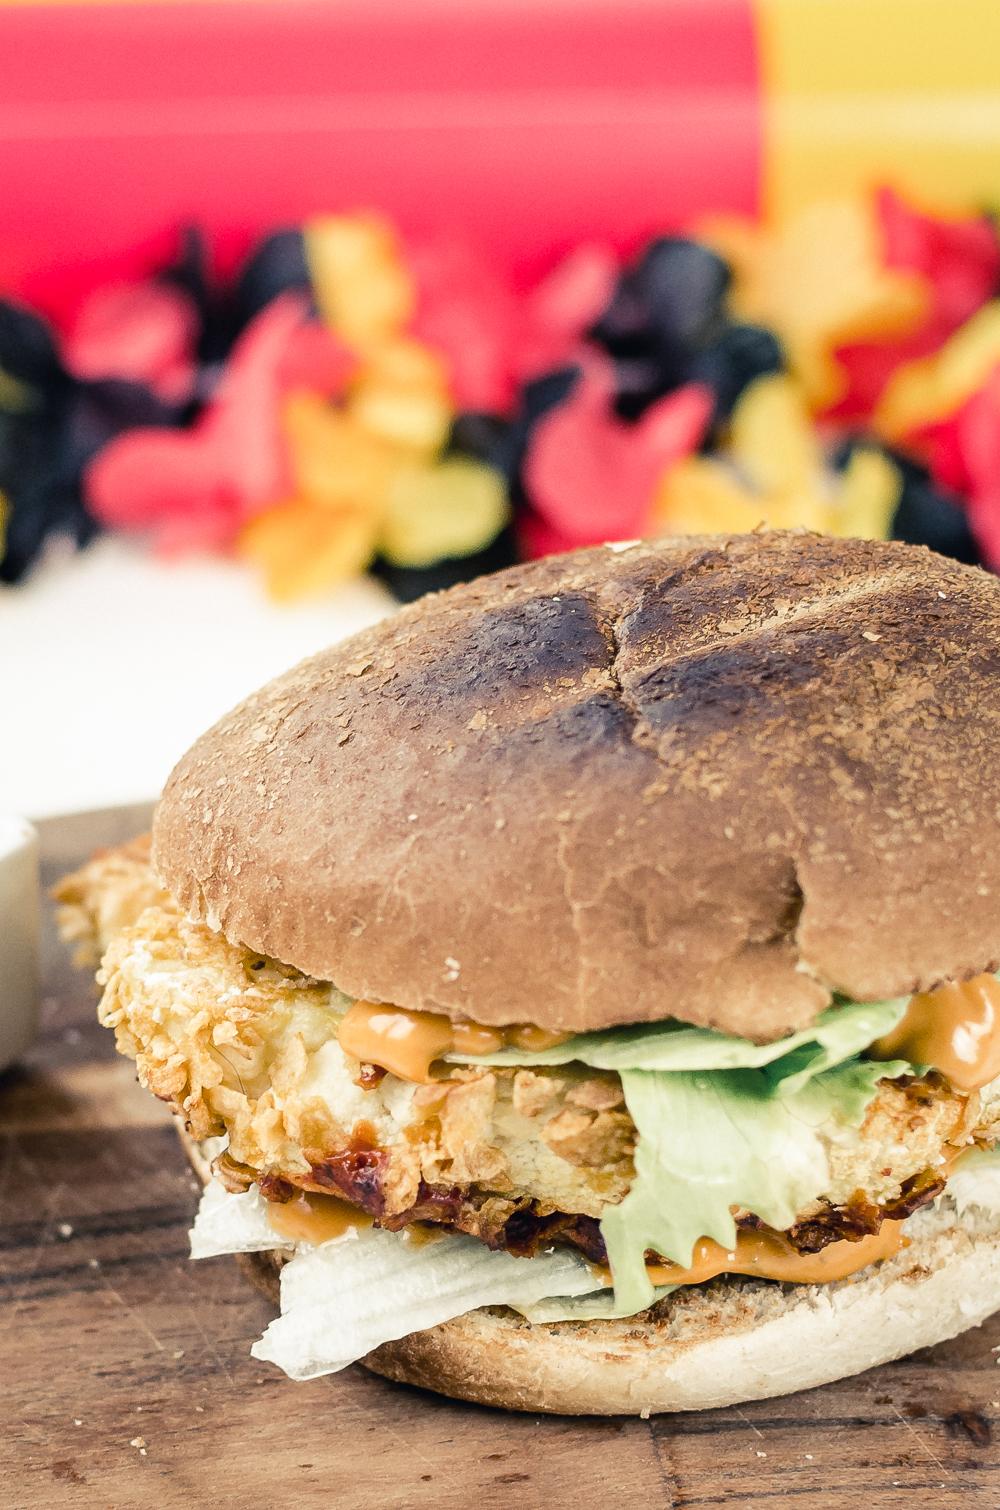 Veggie Blumenkohl Burger Rezept-THOMY Sauce-WM Burger Battle-Grill Rezept Burger-Veggie Burger Rezept-Foodblog-andysparkles